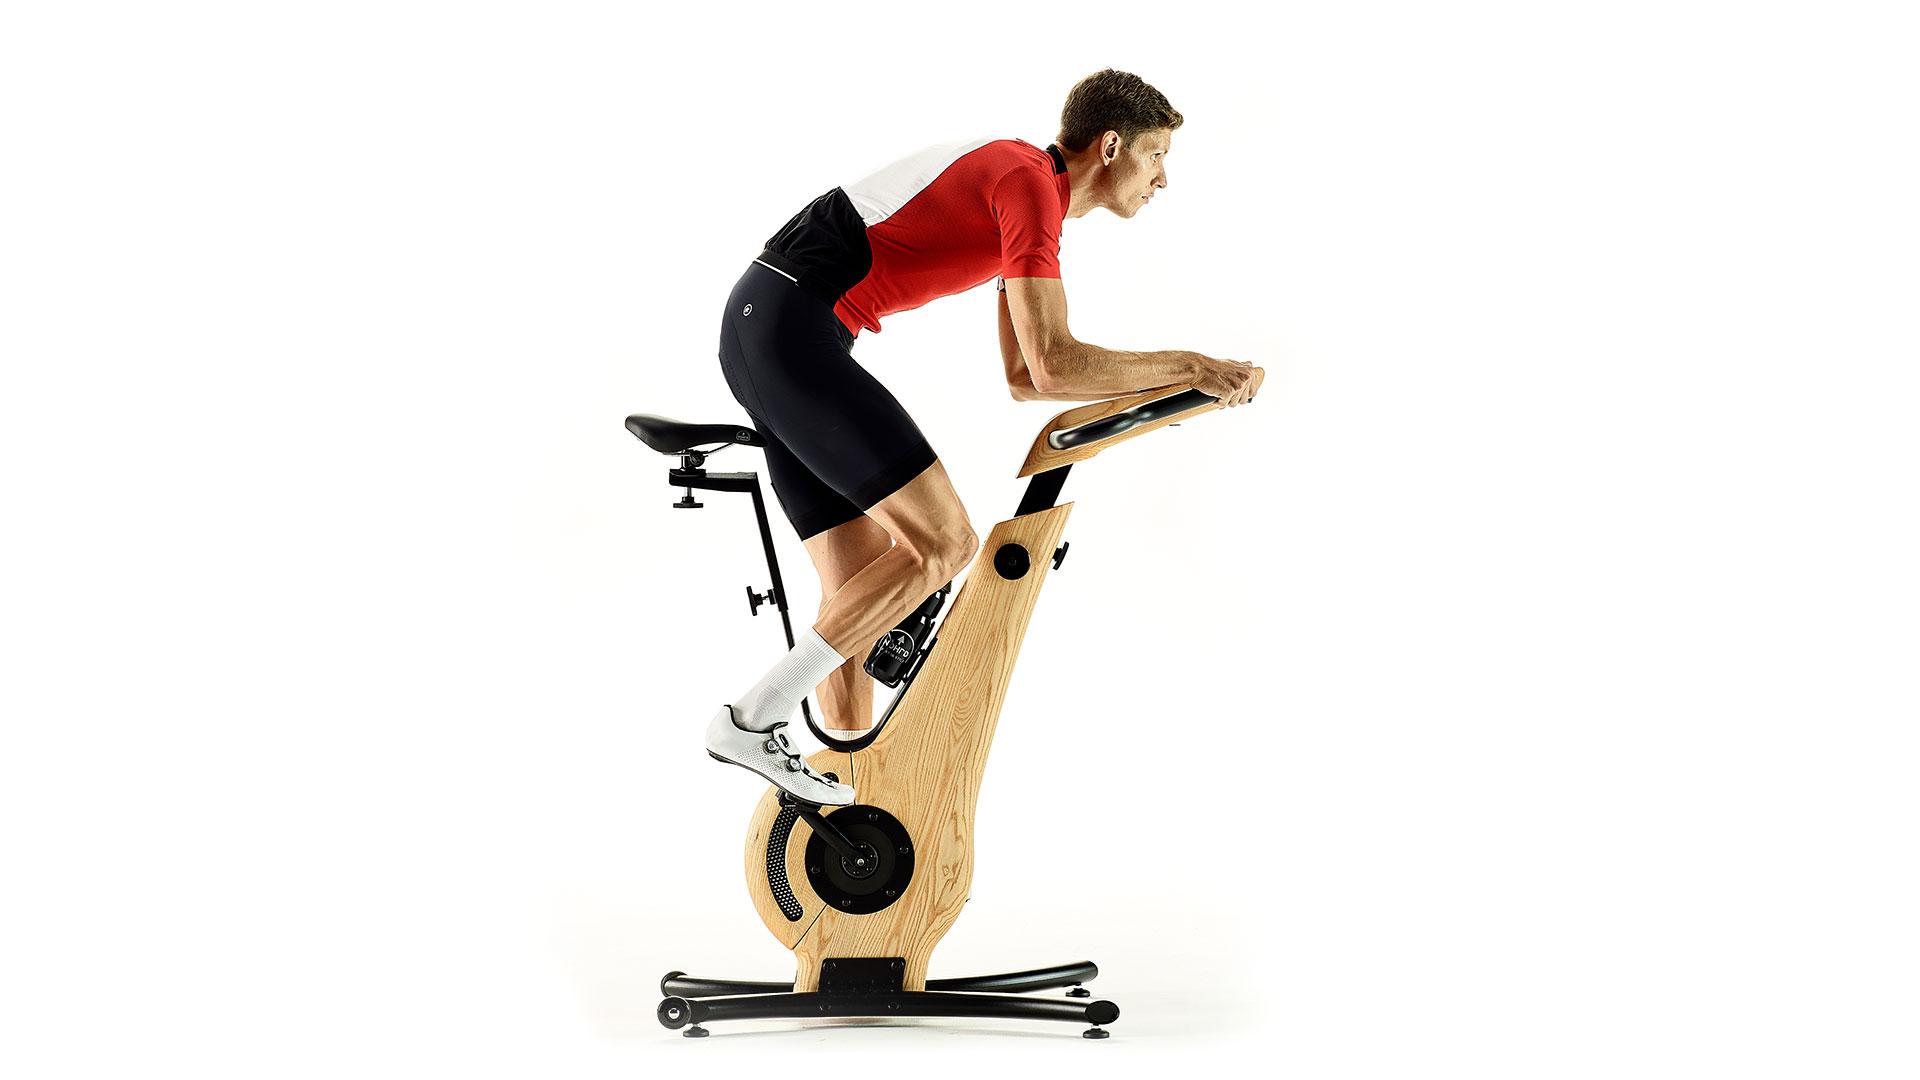 eco gym designers biofit nohrd-bike-spinning.jpg